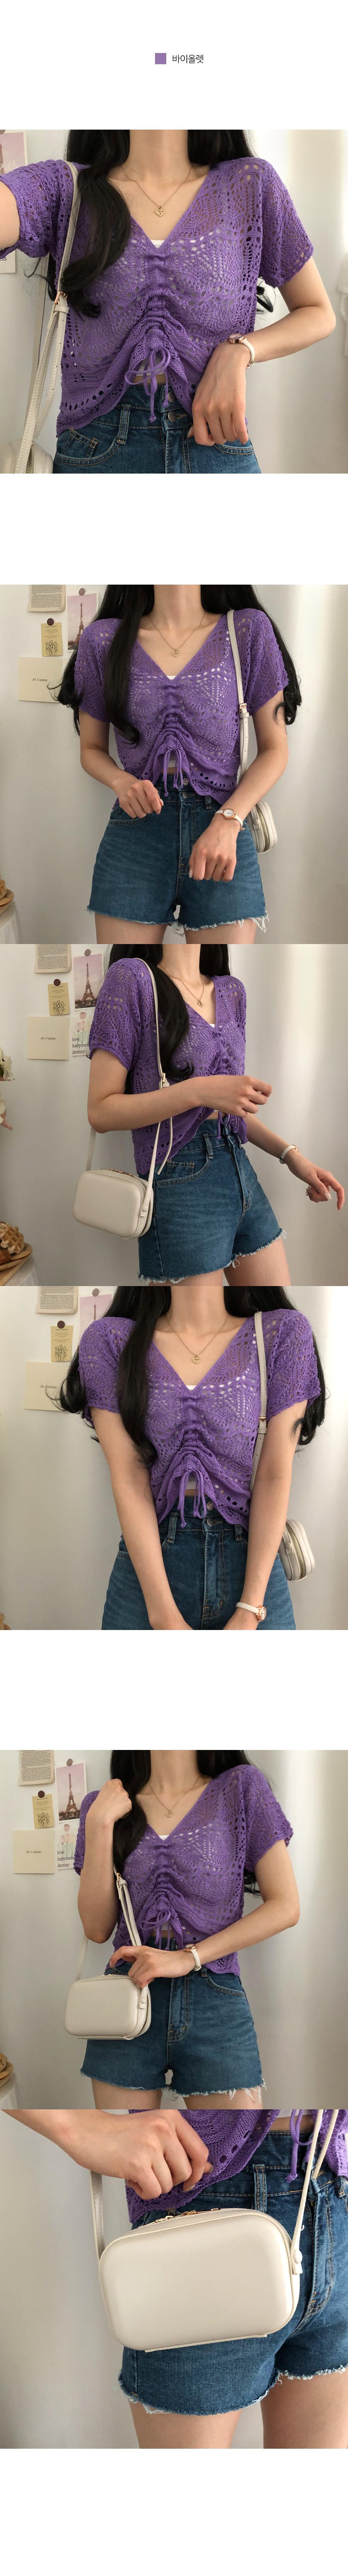 Pong Frape Punching Shirring Short Sleeve Knitwear